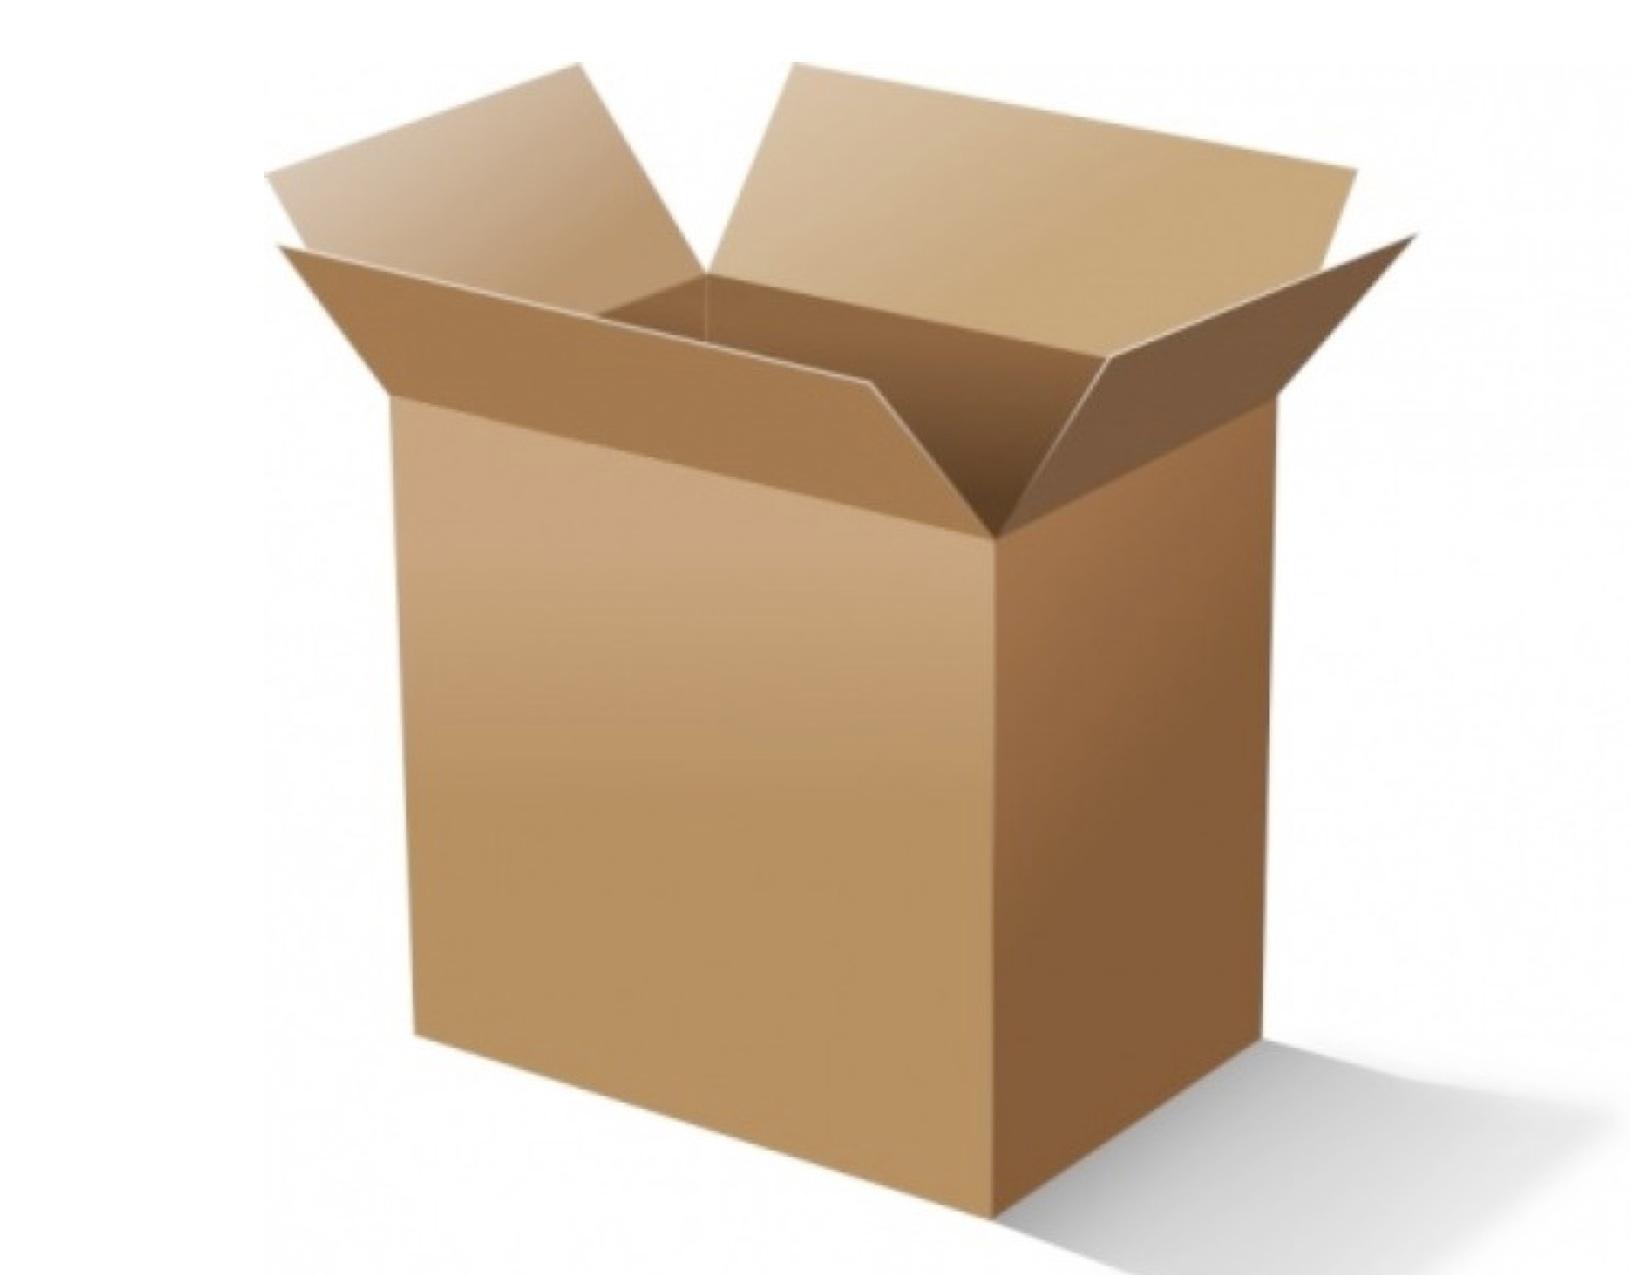 Clipart Box-Clipart Box-7